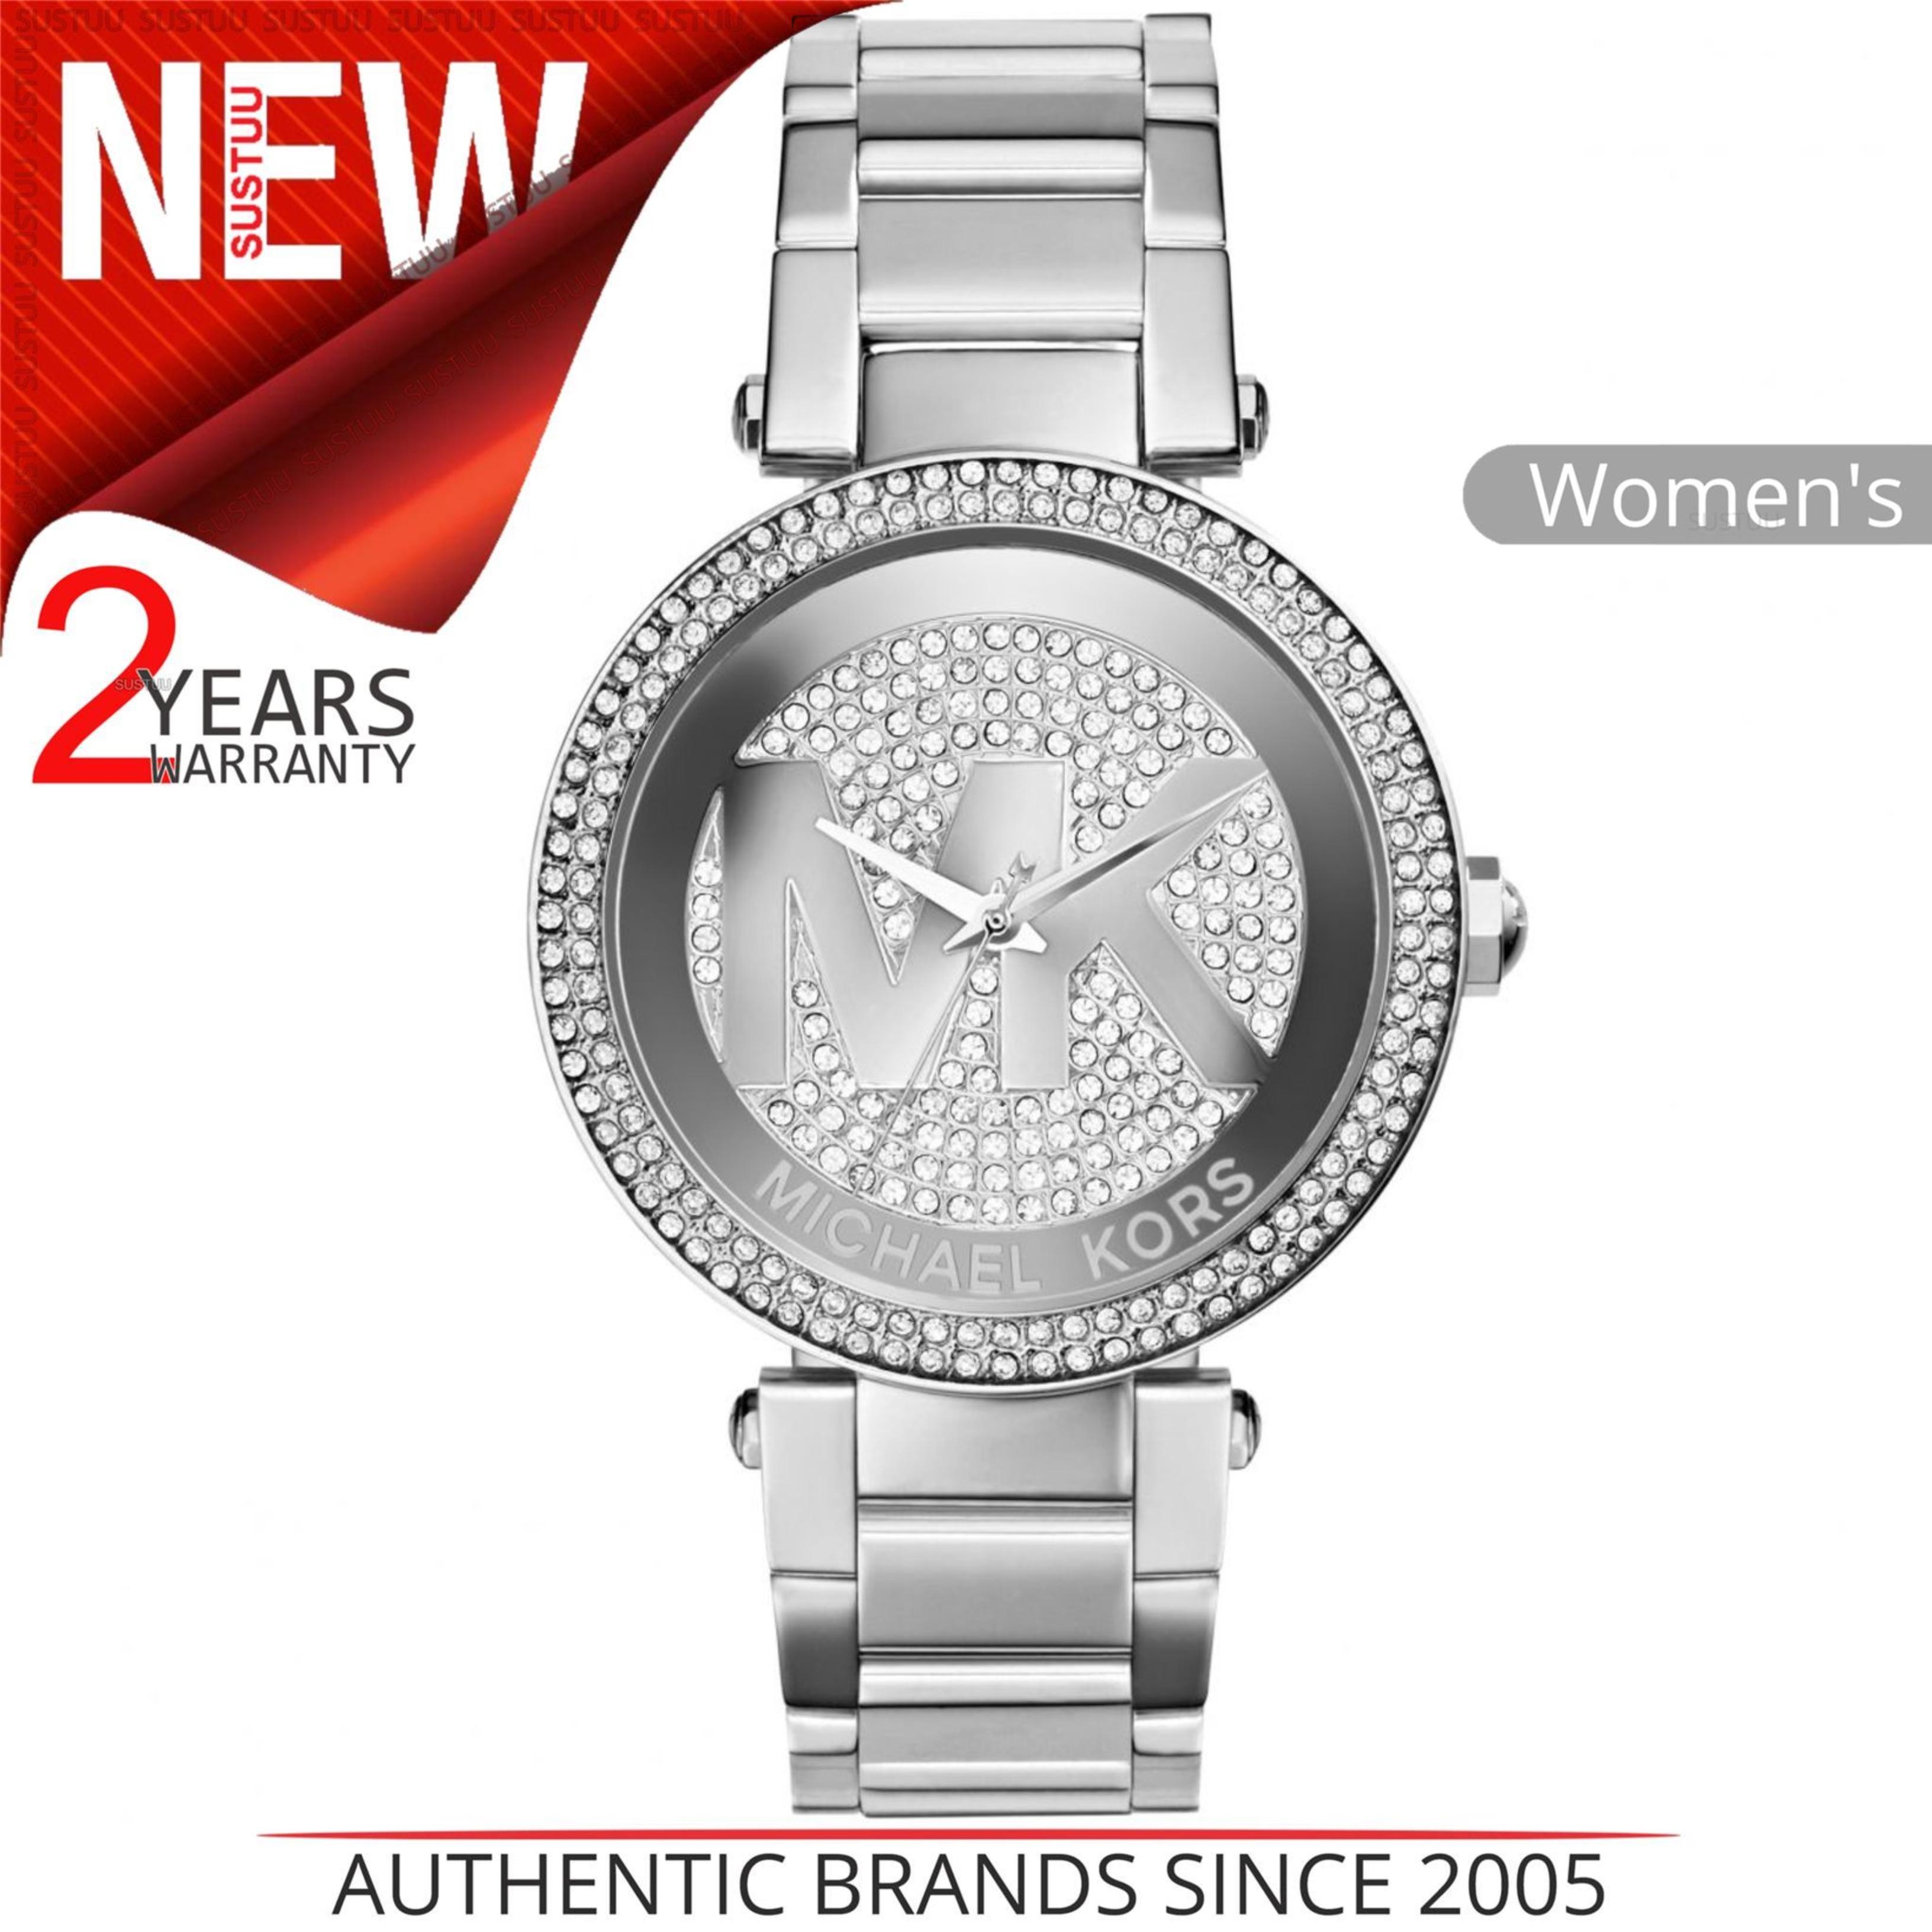 8f1d34d11751 Details about Michael Kors Parker Women Bracelet Watch MK5925│Silver  Crystal Pave MK LogoDial